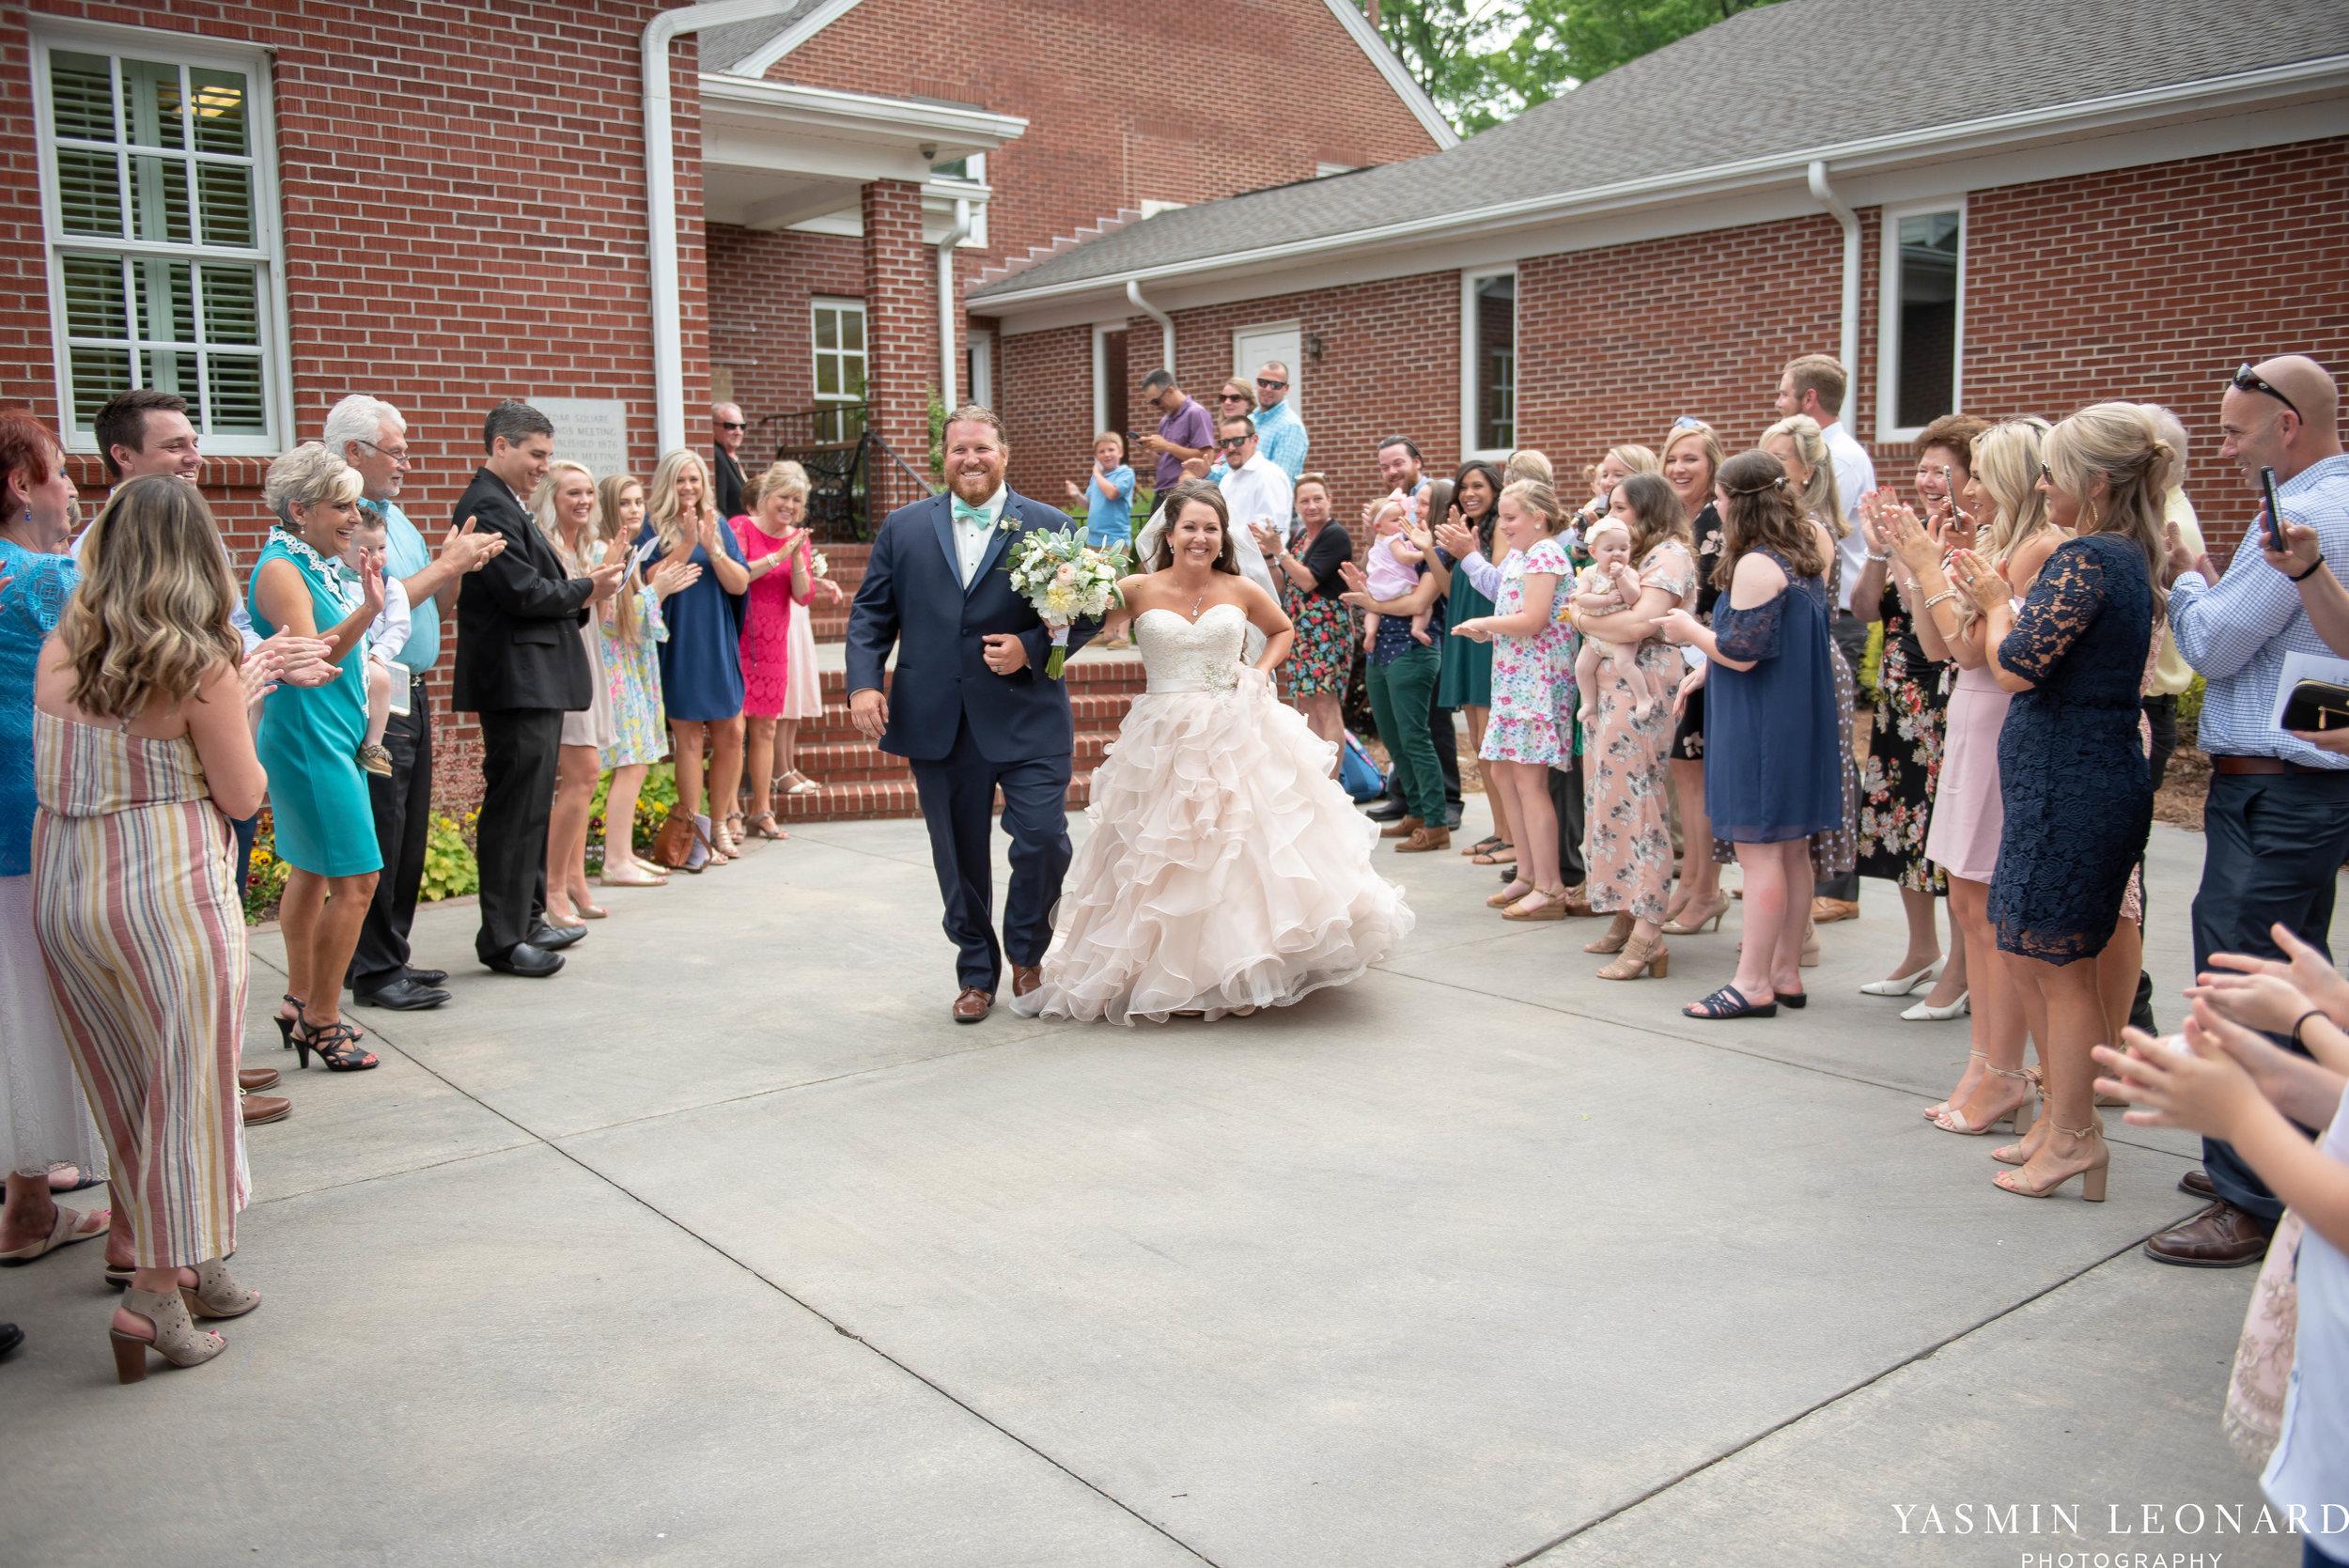 Rain on your wedding day - Rainy Wedding - Plan B for Rain - What to do if it rains on your wedding day - Wedding Inspiration - Outdoor wedding ideas - Rainy Wedding Pictures - Yasmin Leonard Photography-34.jpg